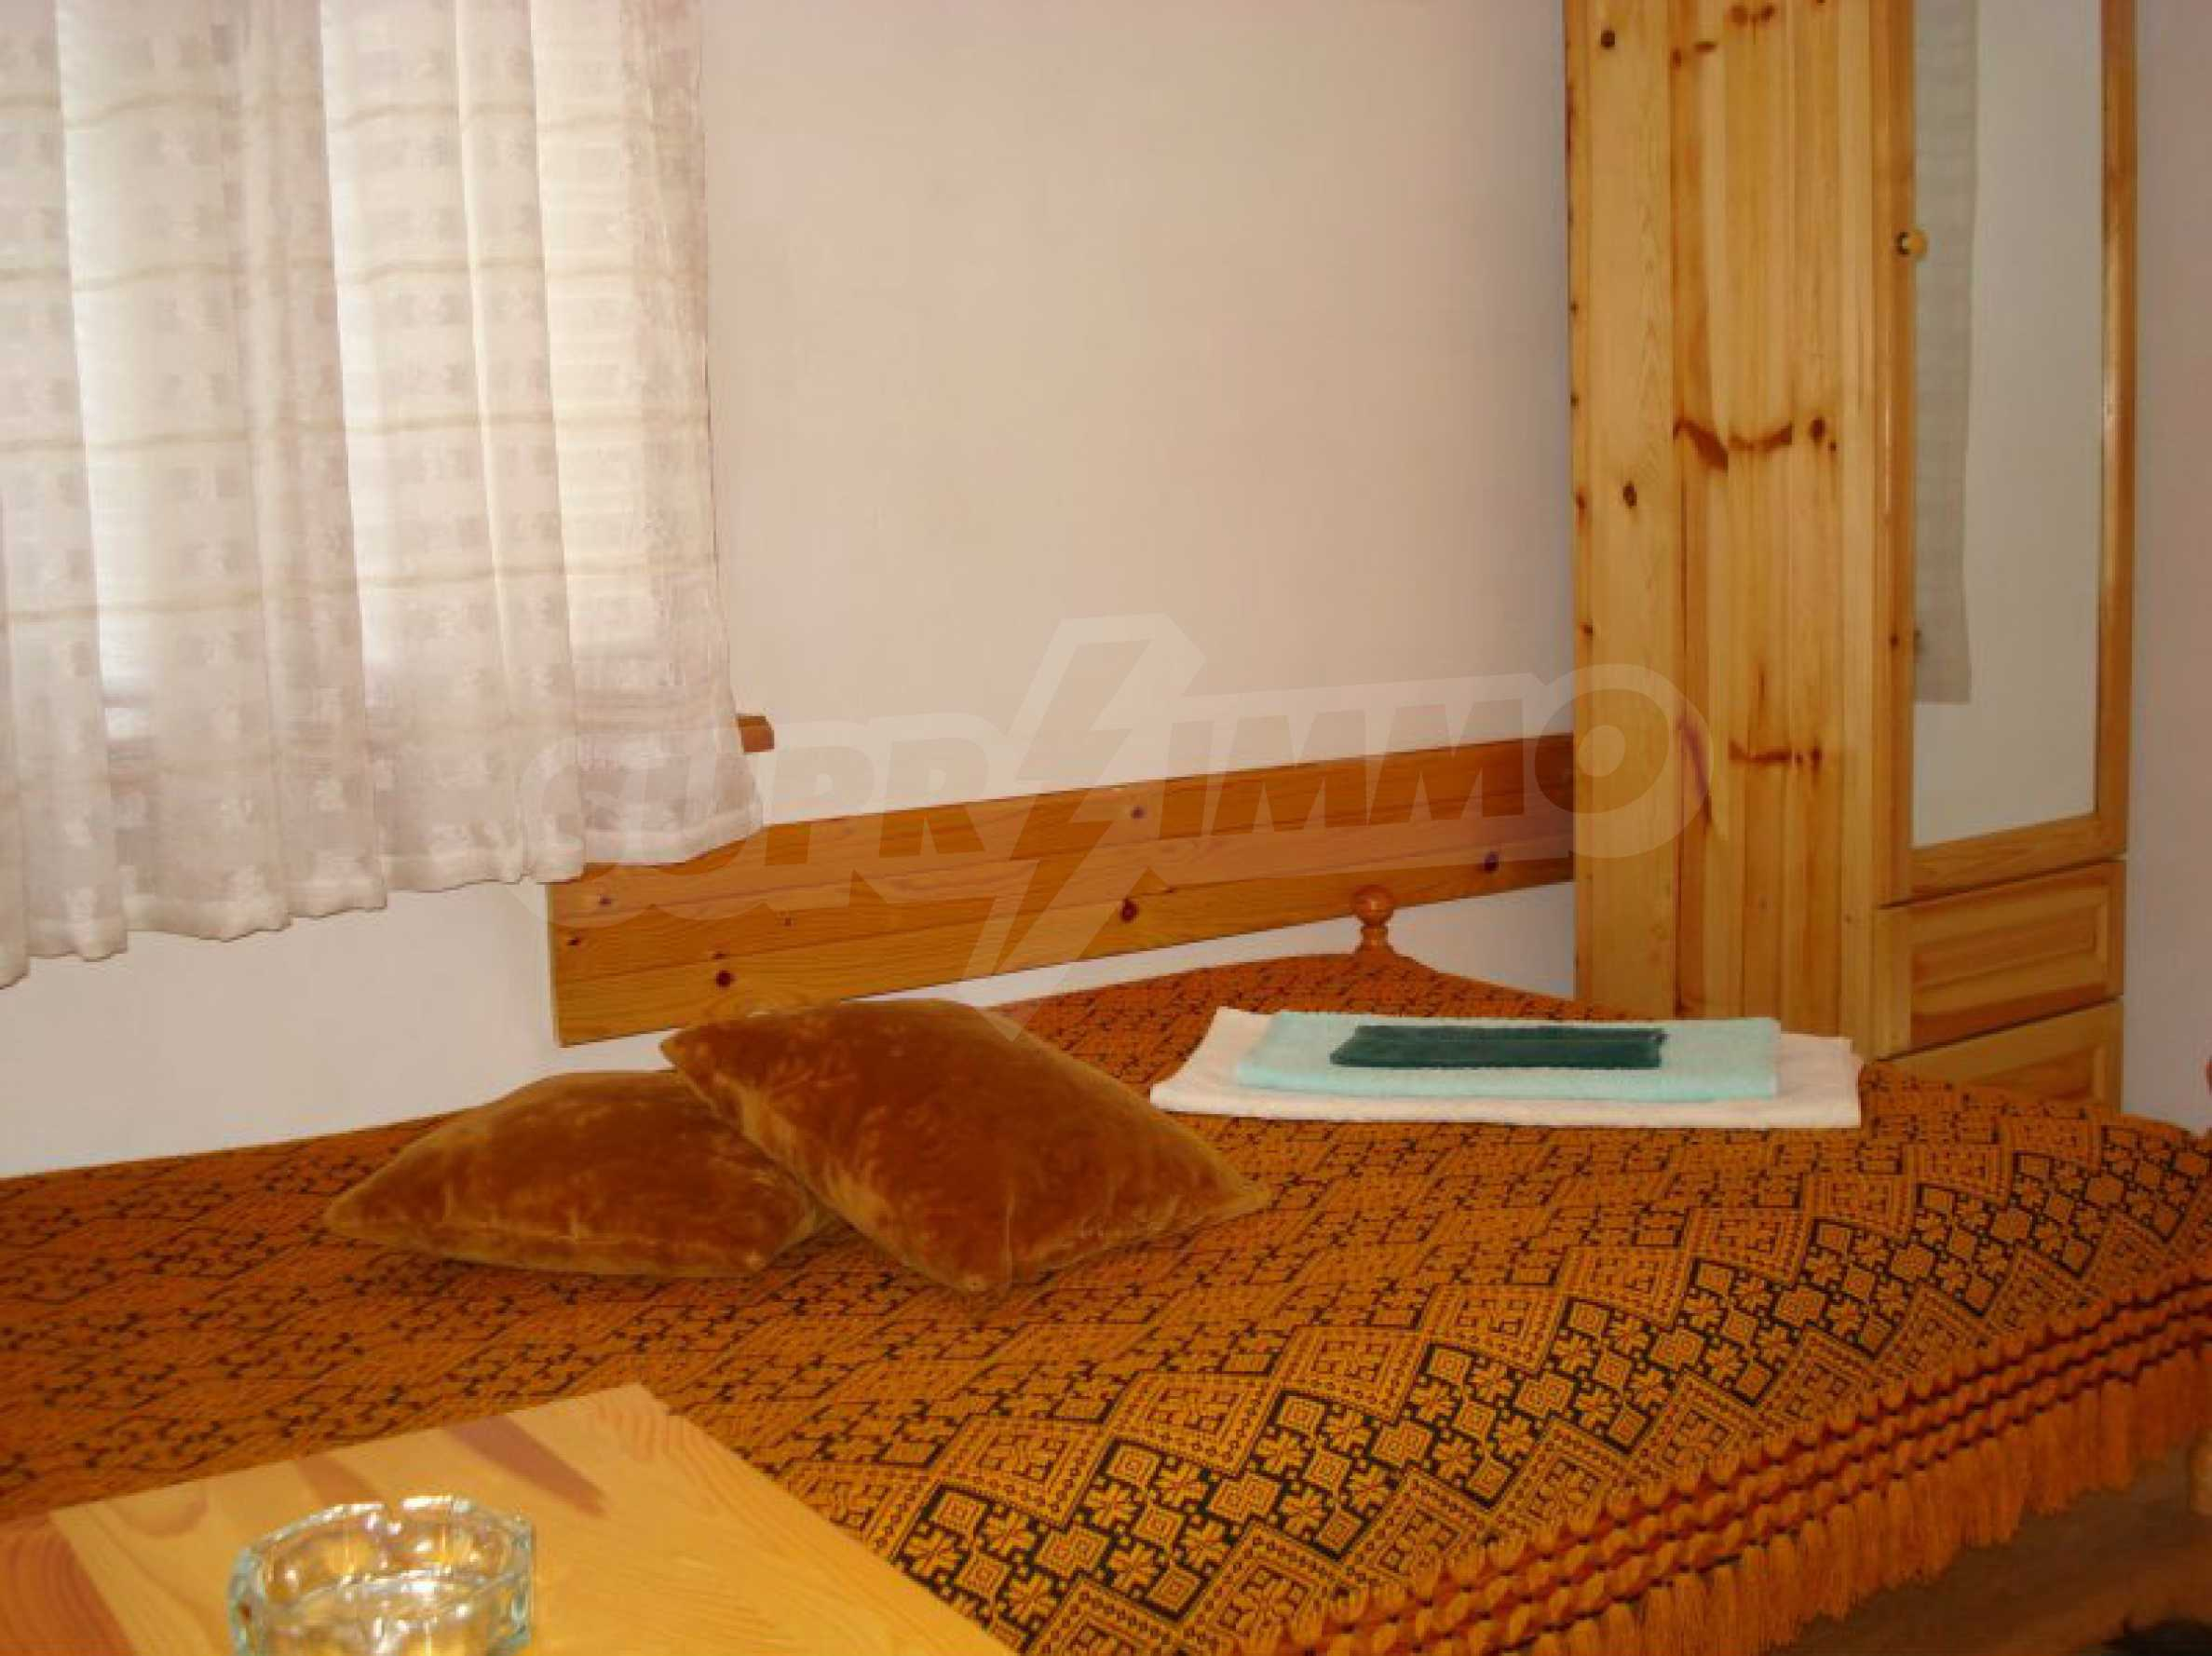 Hotelanlage mit Restaurant am Ufer des Flusses Osam in Lovech 30